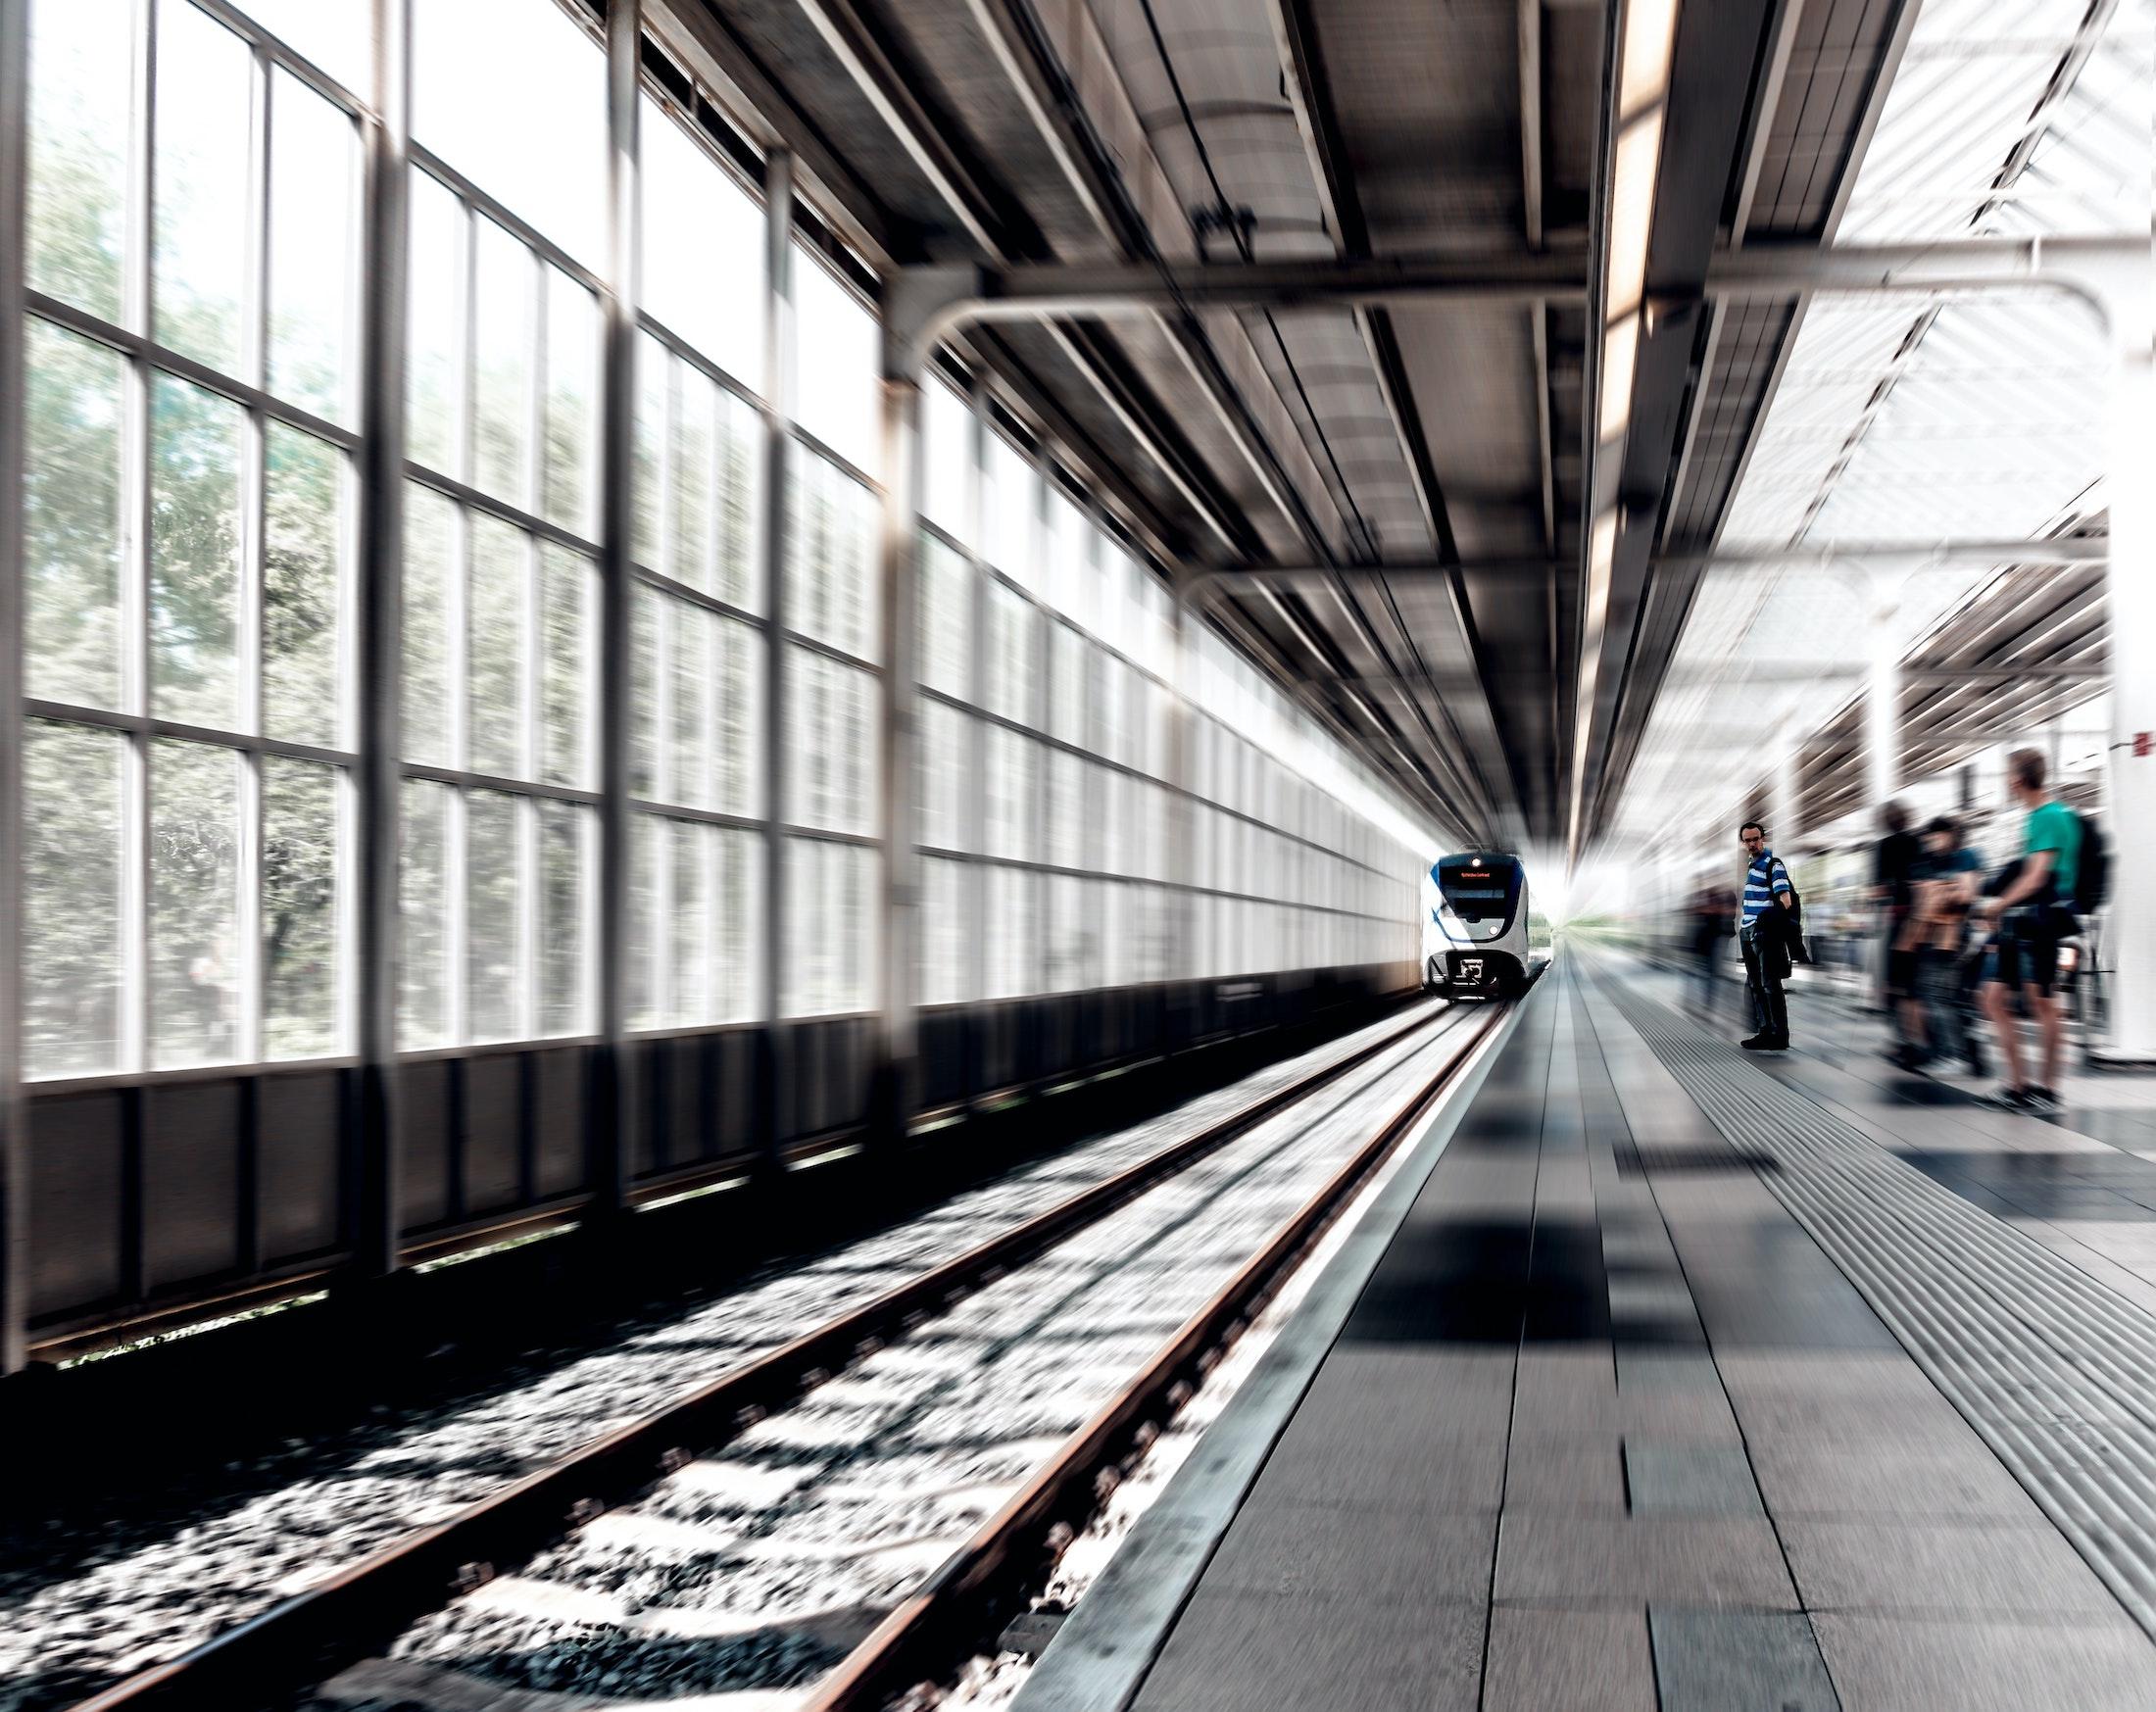 High speed train approaching the platform